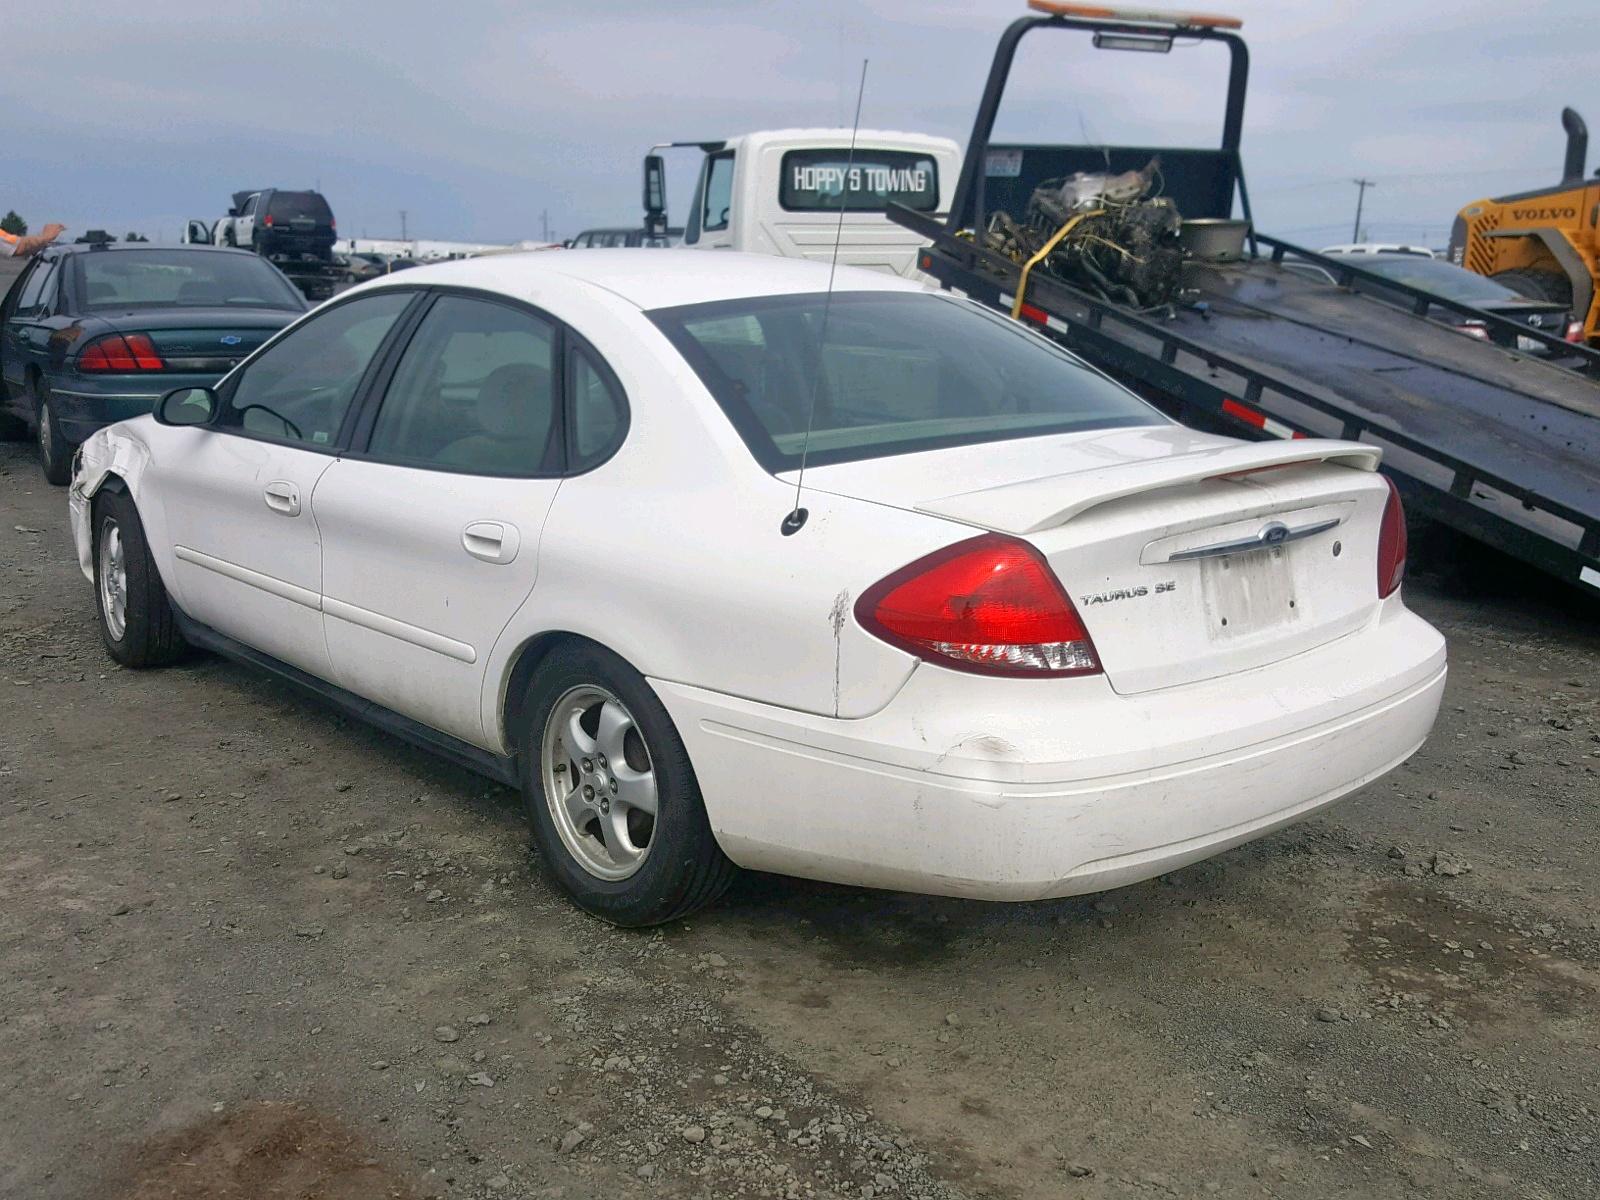 1FAFP53U06A132220 - 2006 Ford Taurus Se 3.0L [Angle] View